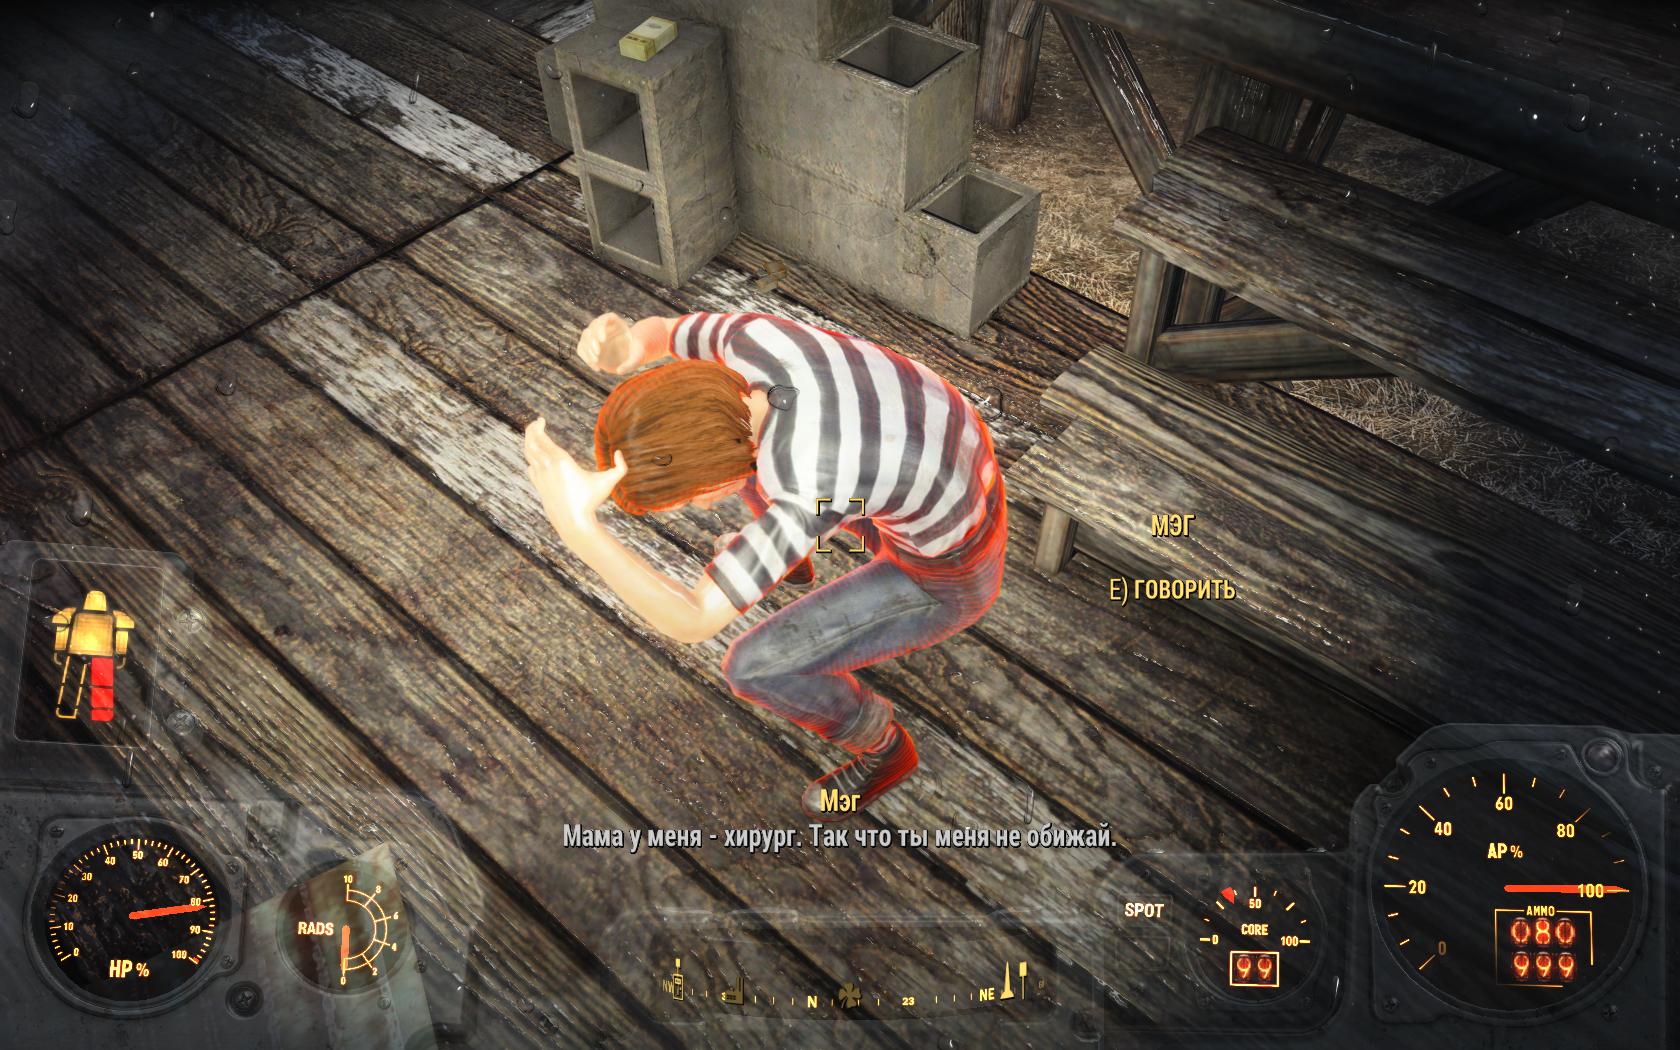 Реплики Мэг невпопад с ситуацией 2 (последствия битвы за Банкер-Хилл) - Fallout 4 Мэг